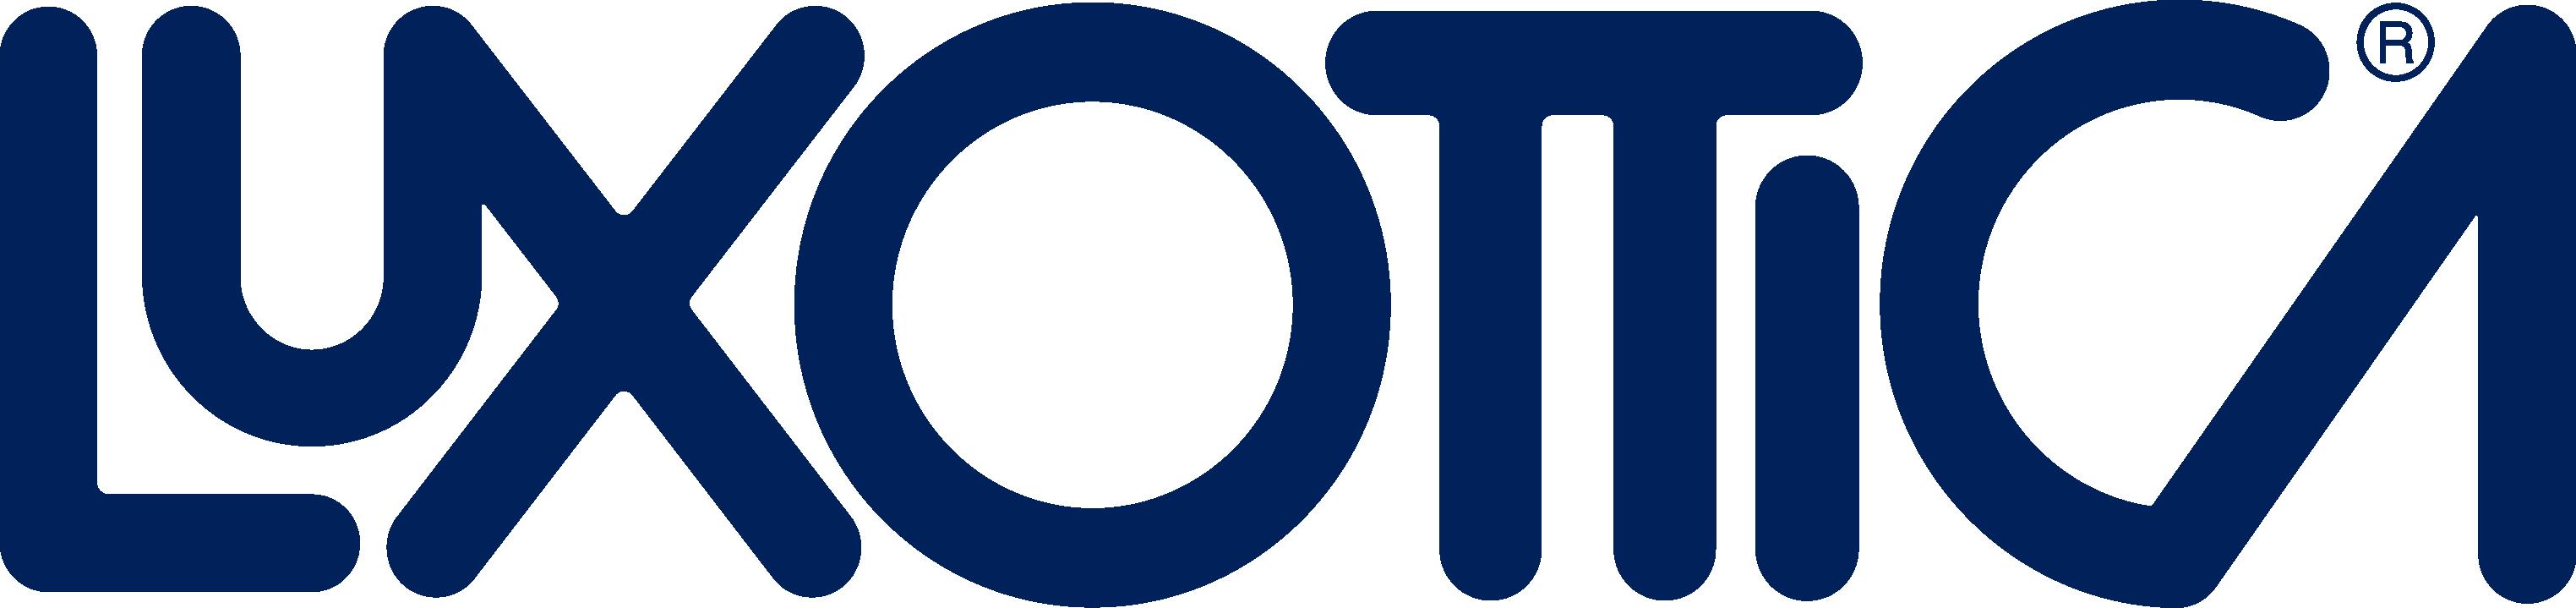 LX_logo_2021_Blue